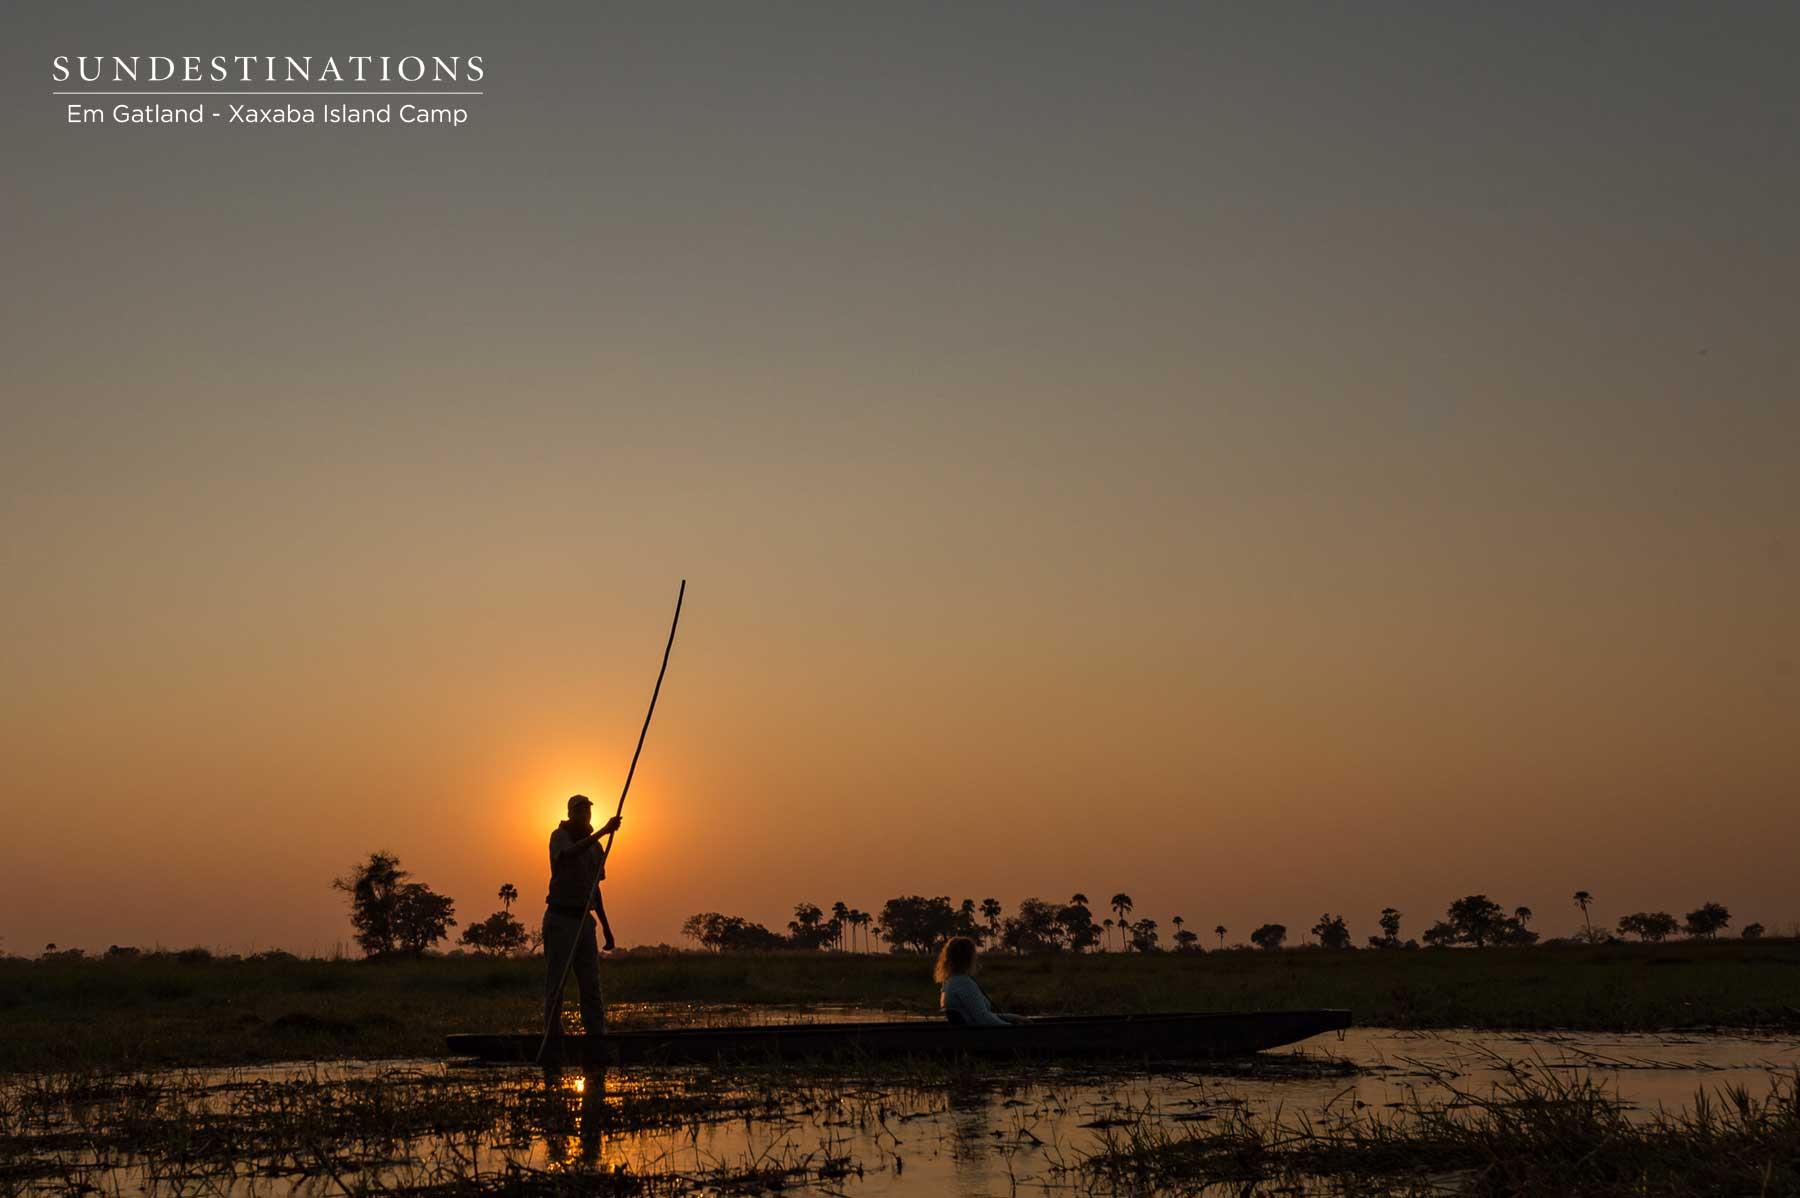 Botswana Sunsets at Xaxaba